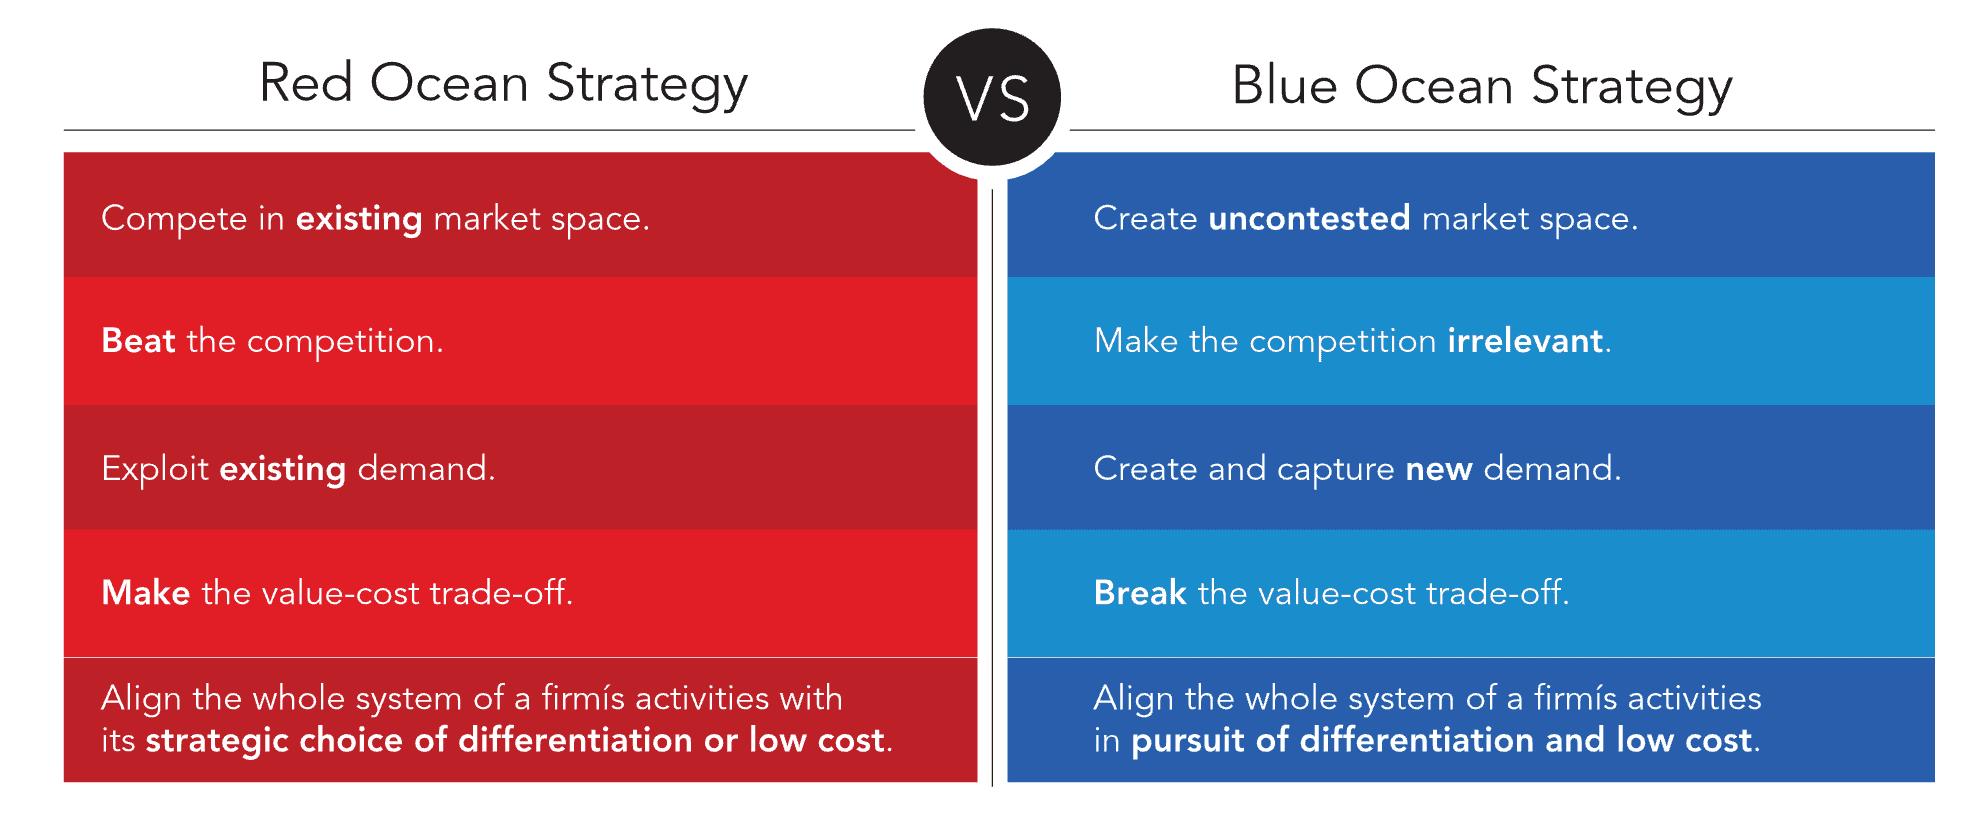 Stratégie Red Ocean vs Stratégie Blue Ocean